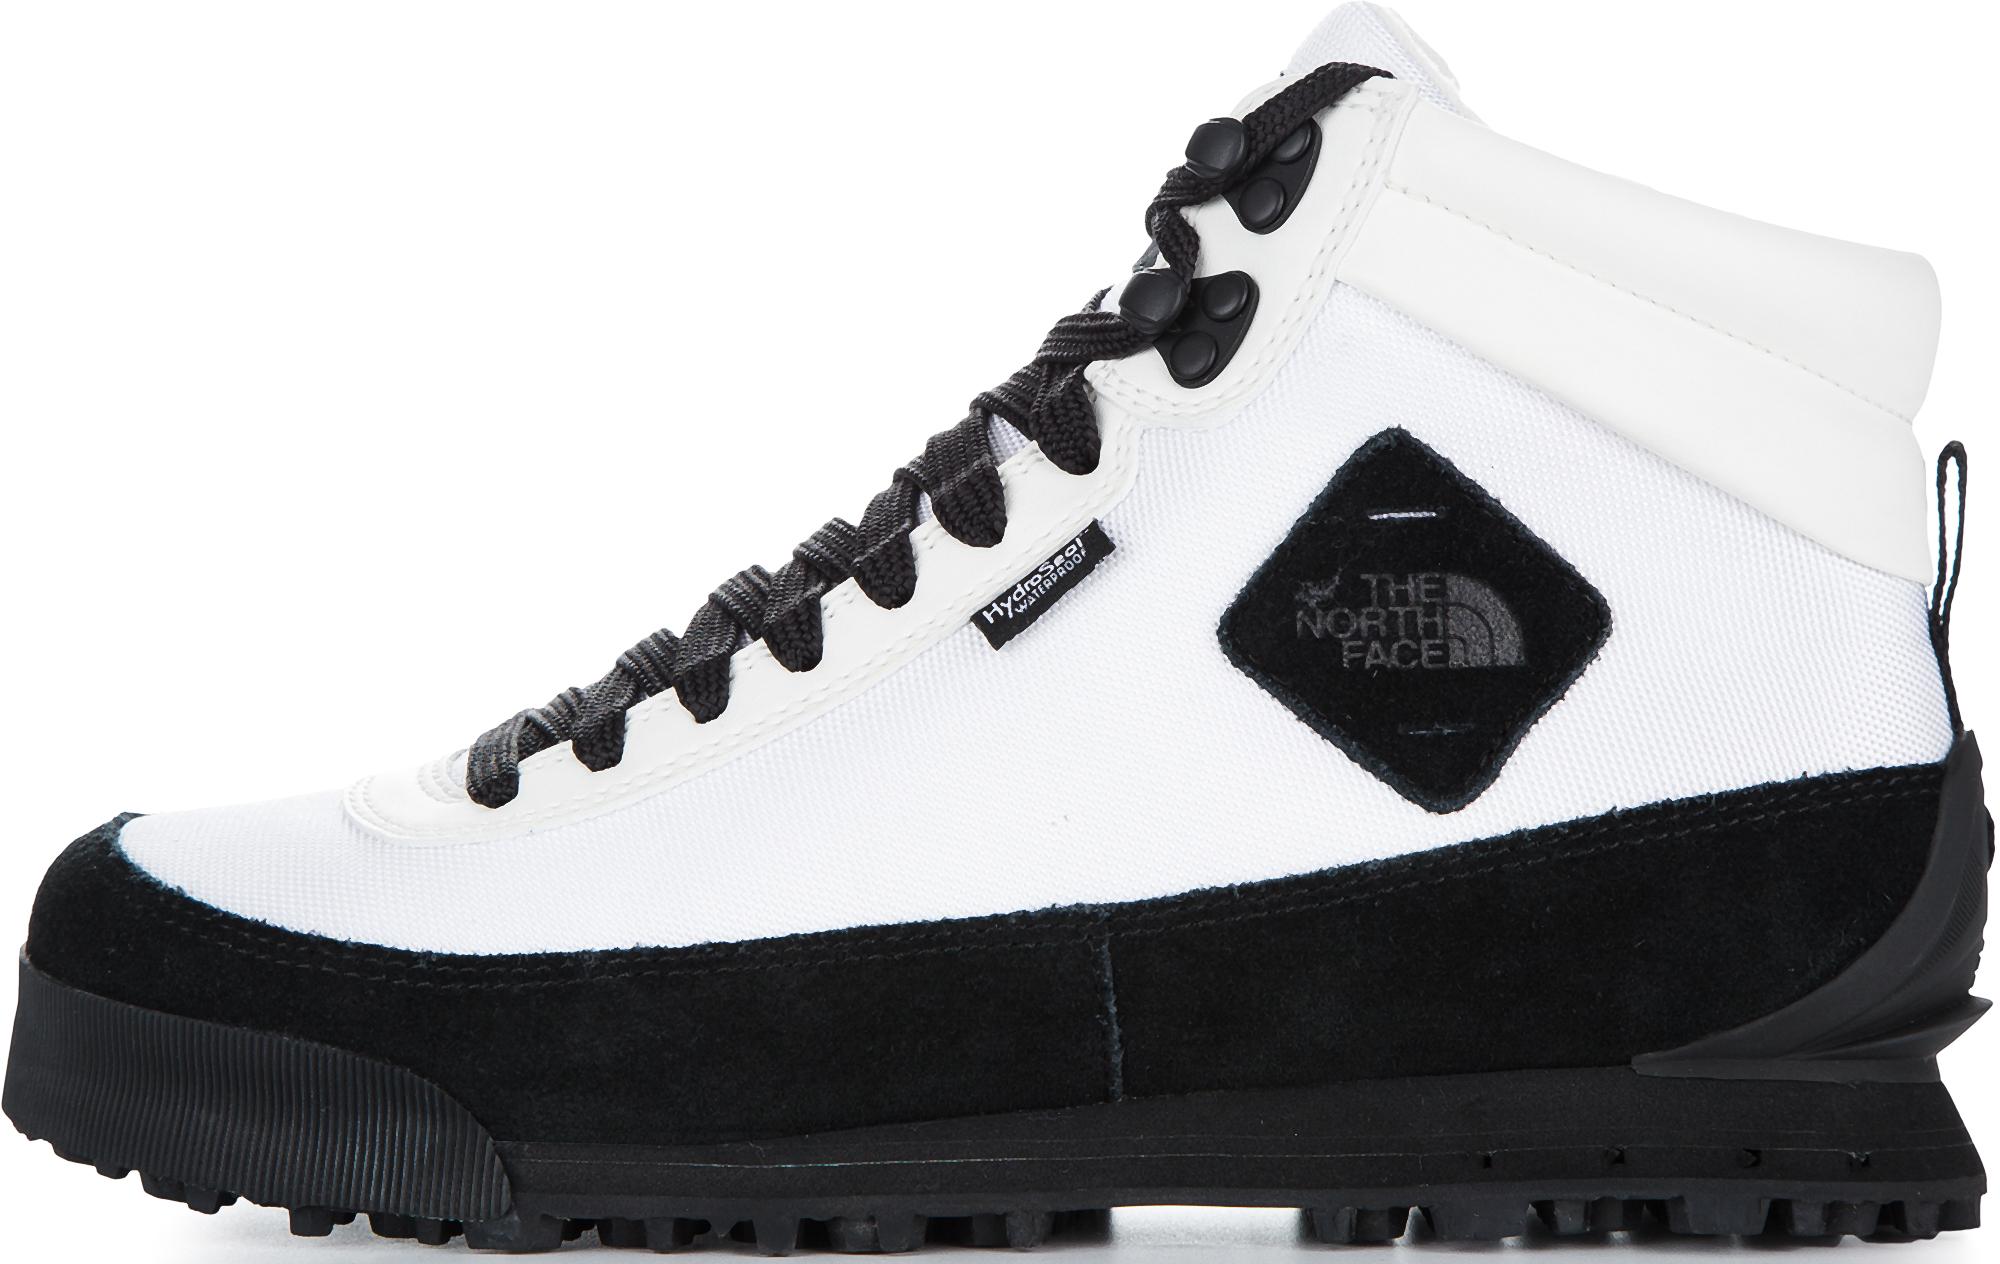 цена The North Face Ботинки утепленные женские The North Face Back-2-Berk Boot 2, размер 40 онлайн в 2017 году